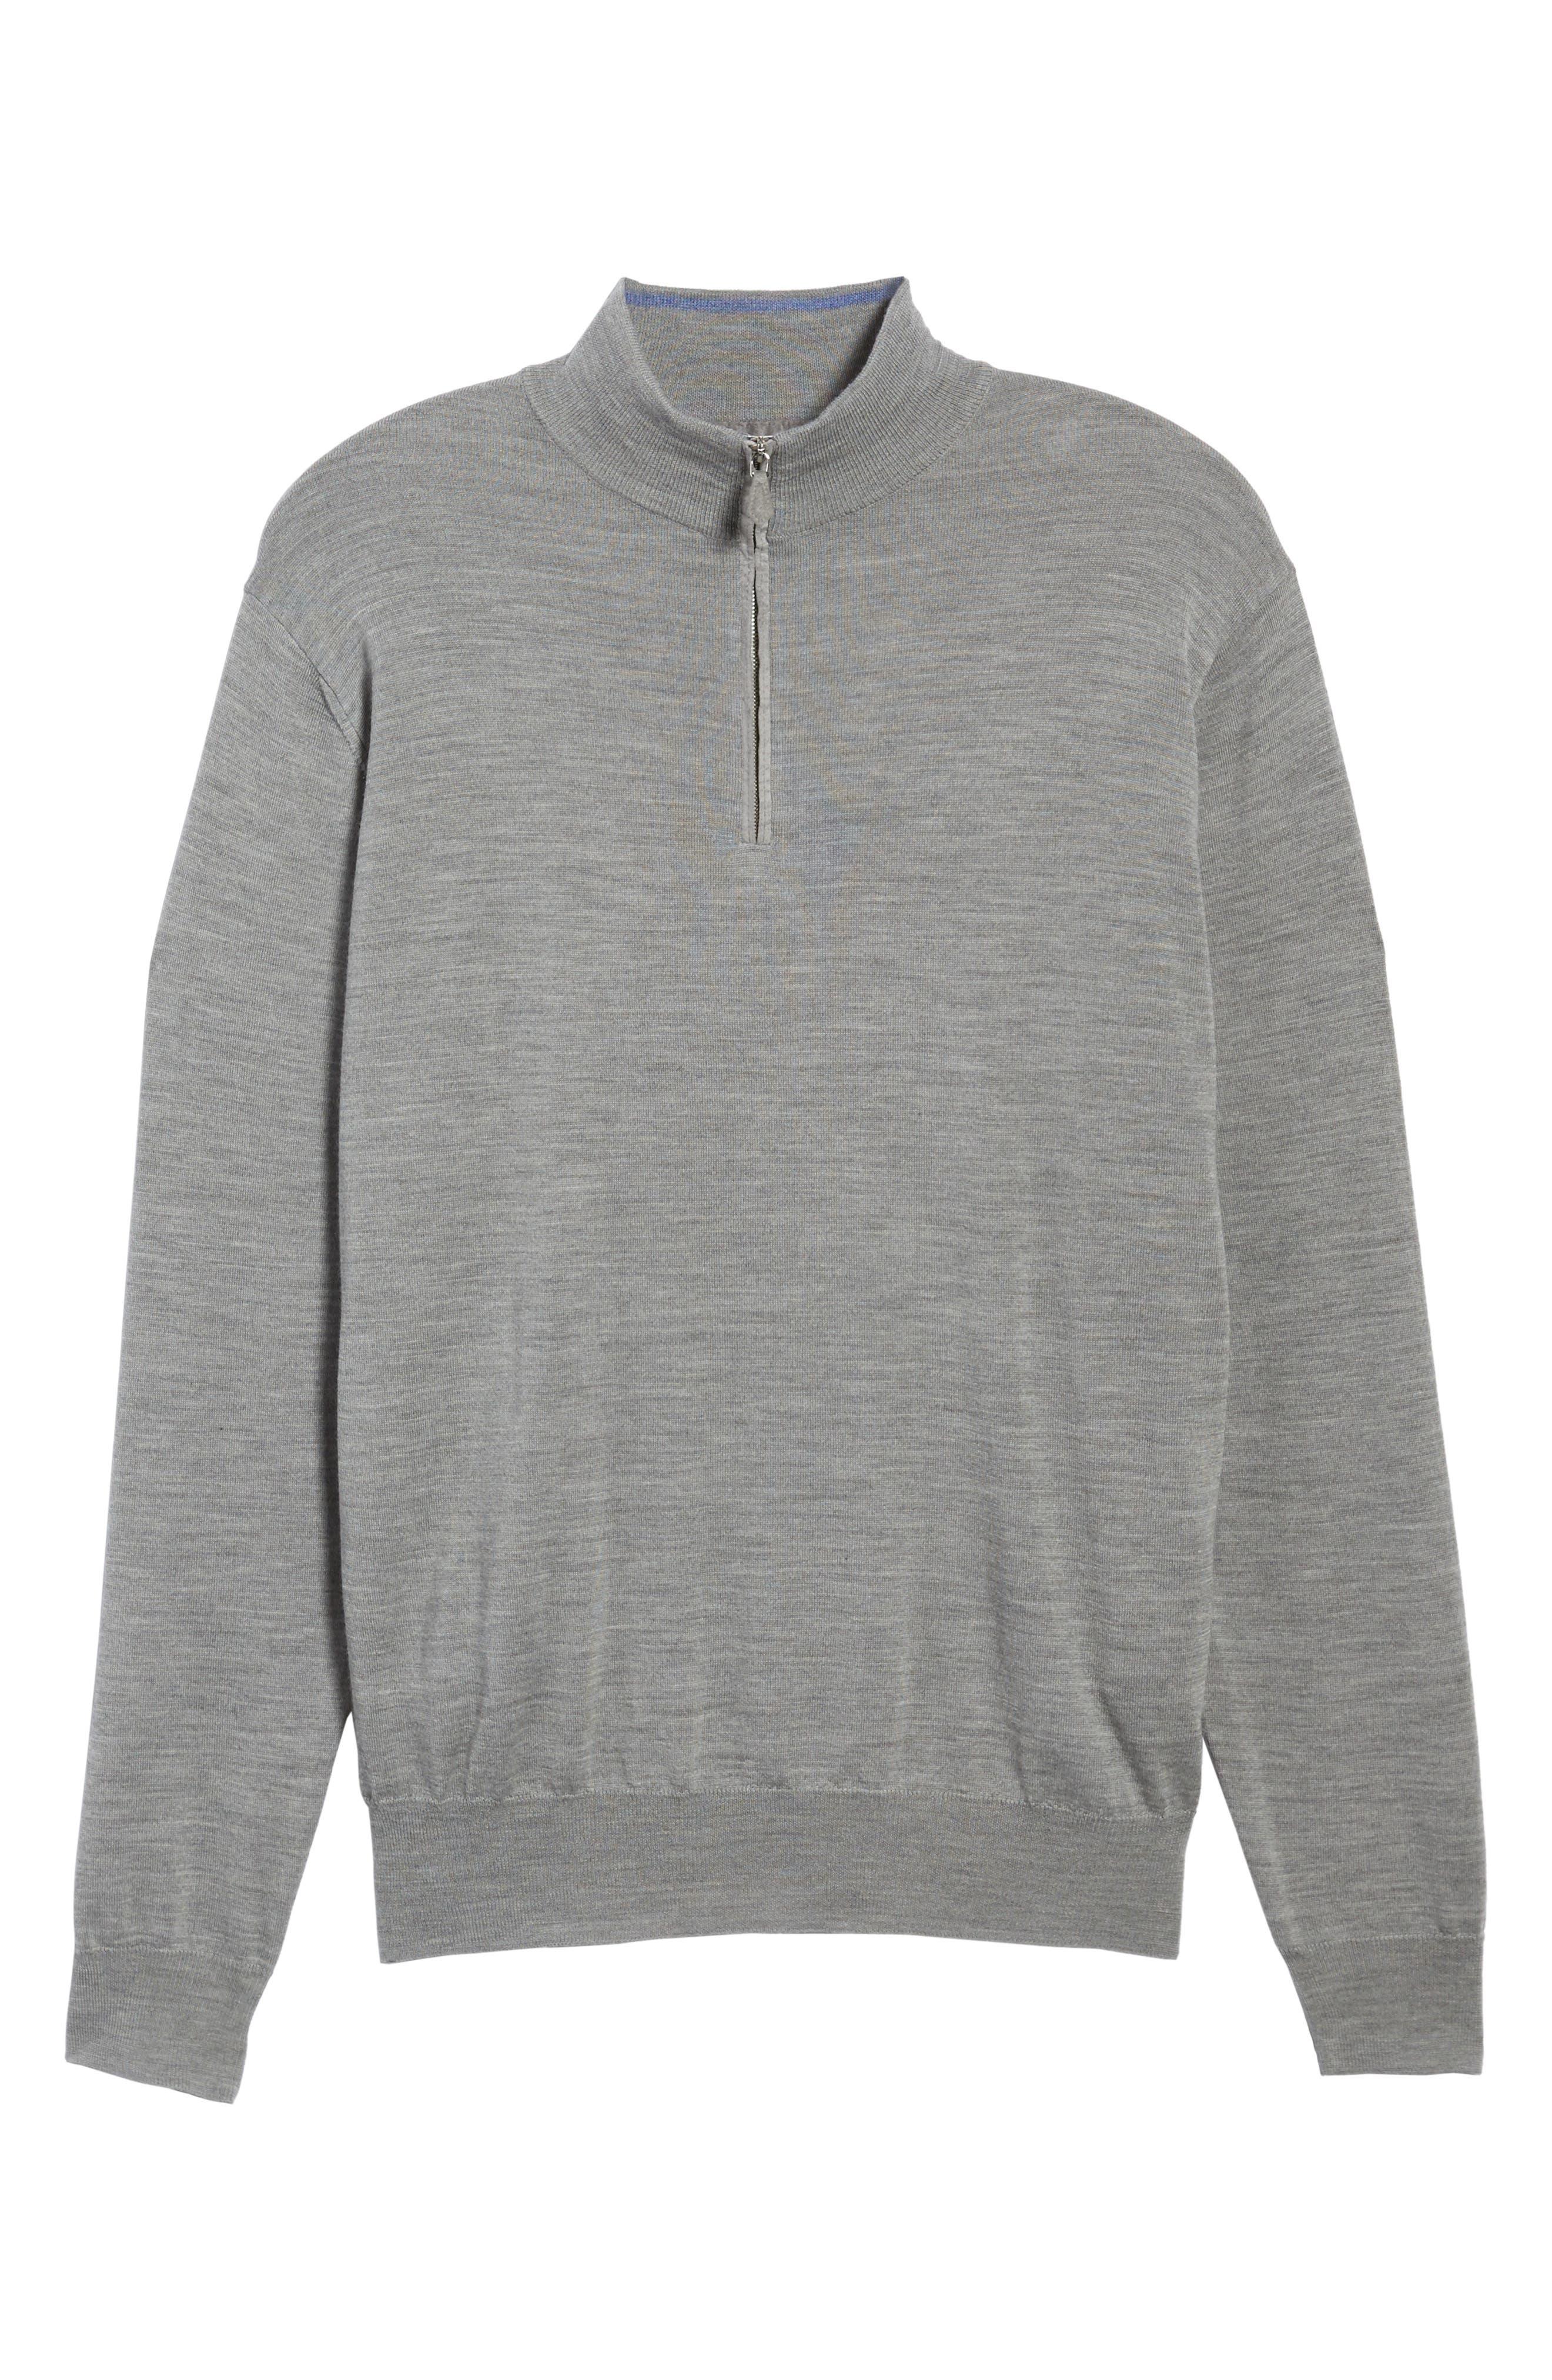 Wool Blend Quarter Zip Sweater,                             Alternate thumbnail 11, color,